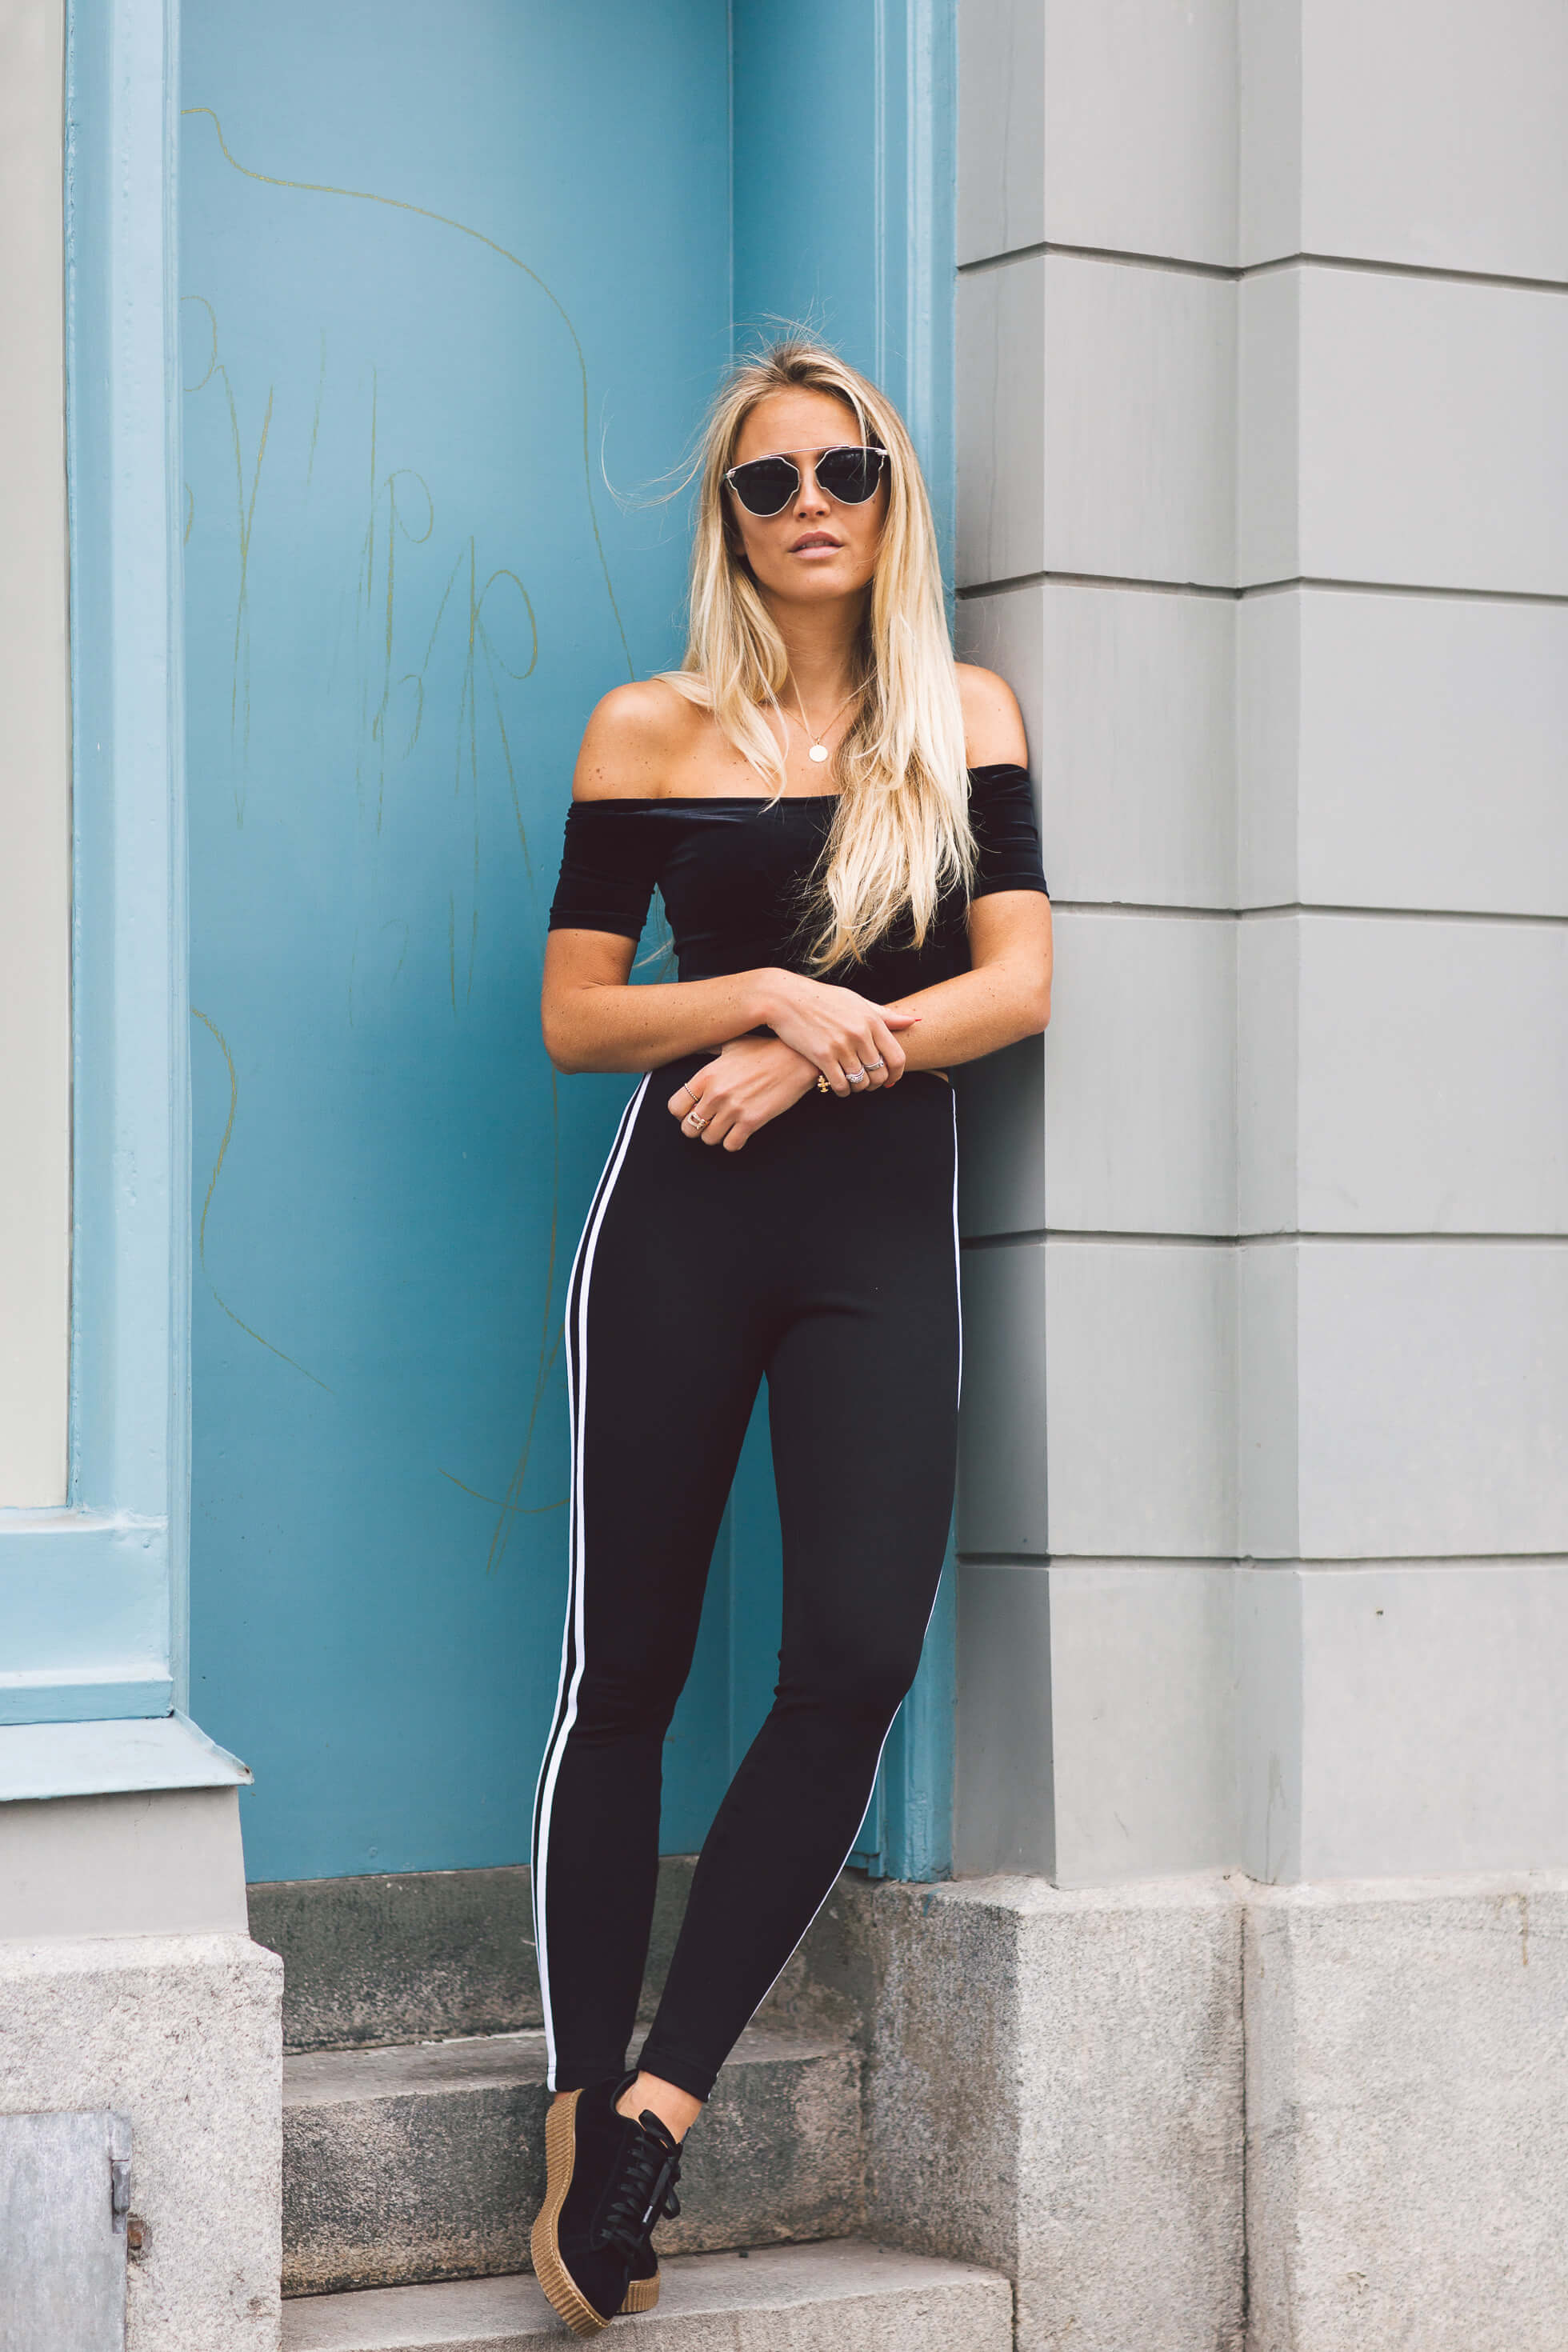 janni-deler-bubbleroom-outfits8S0A8500